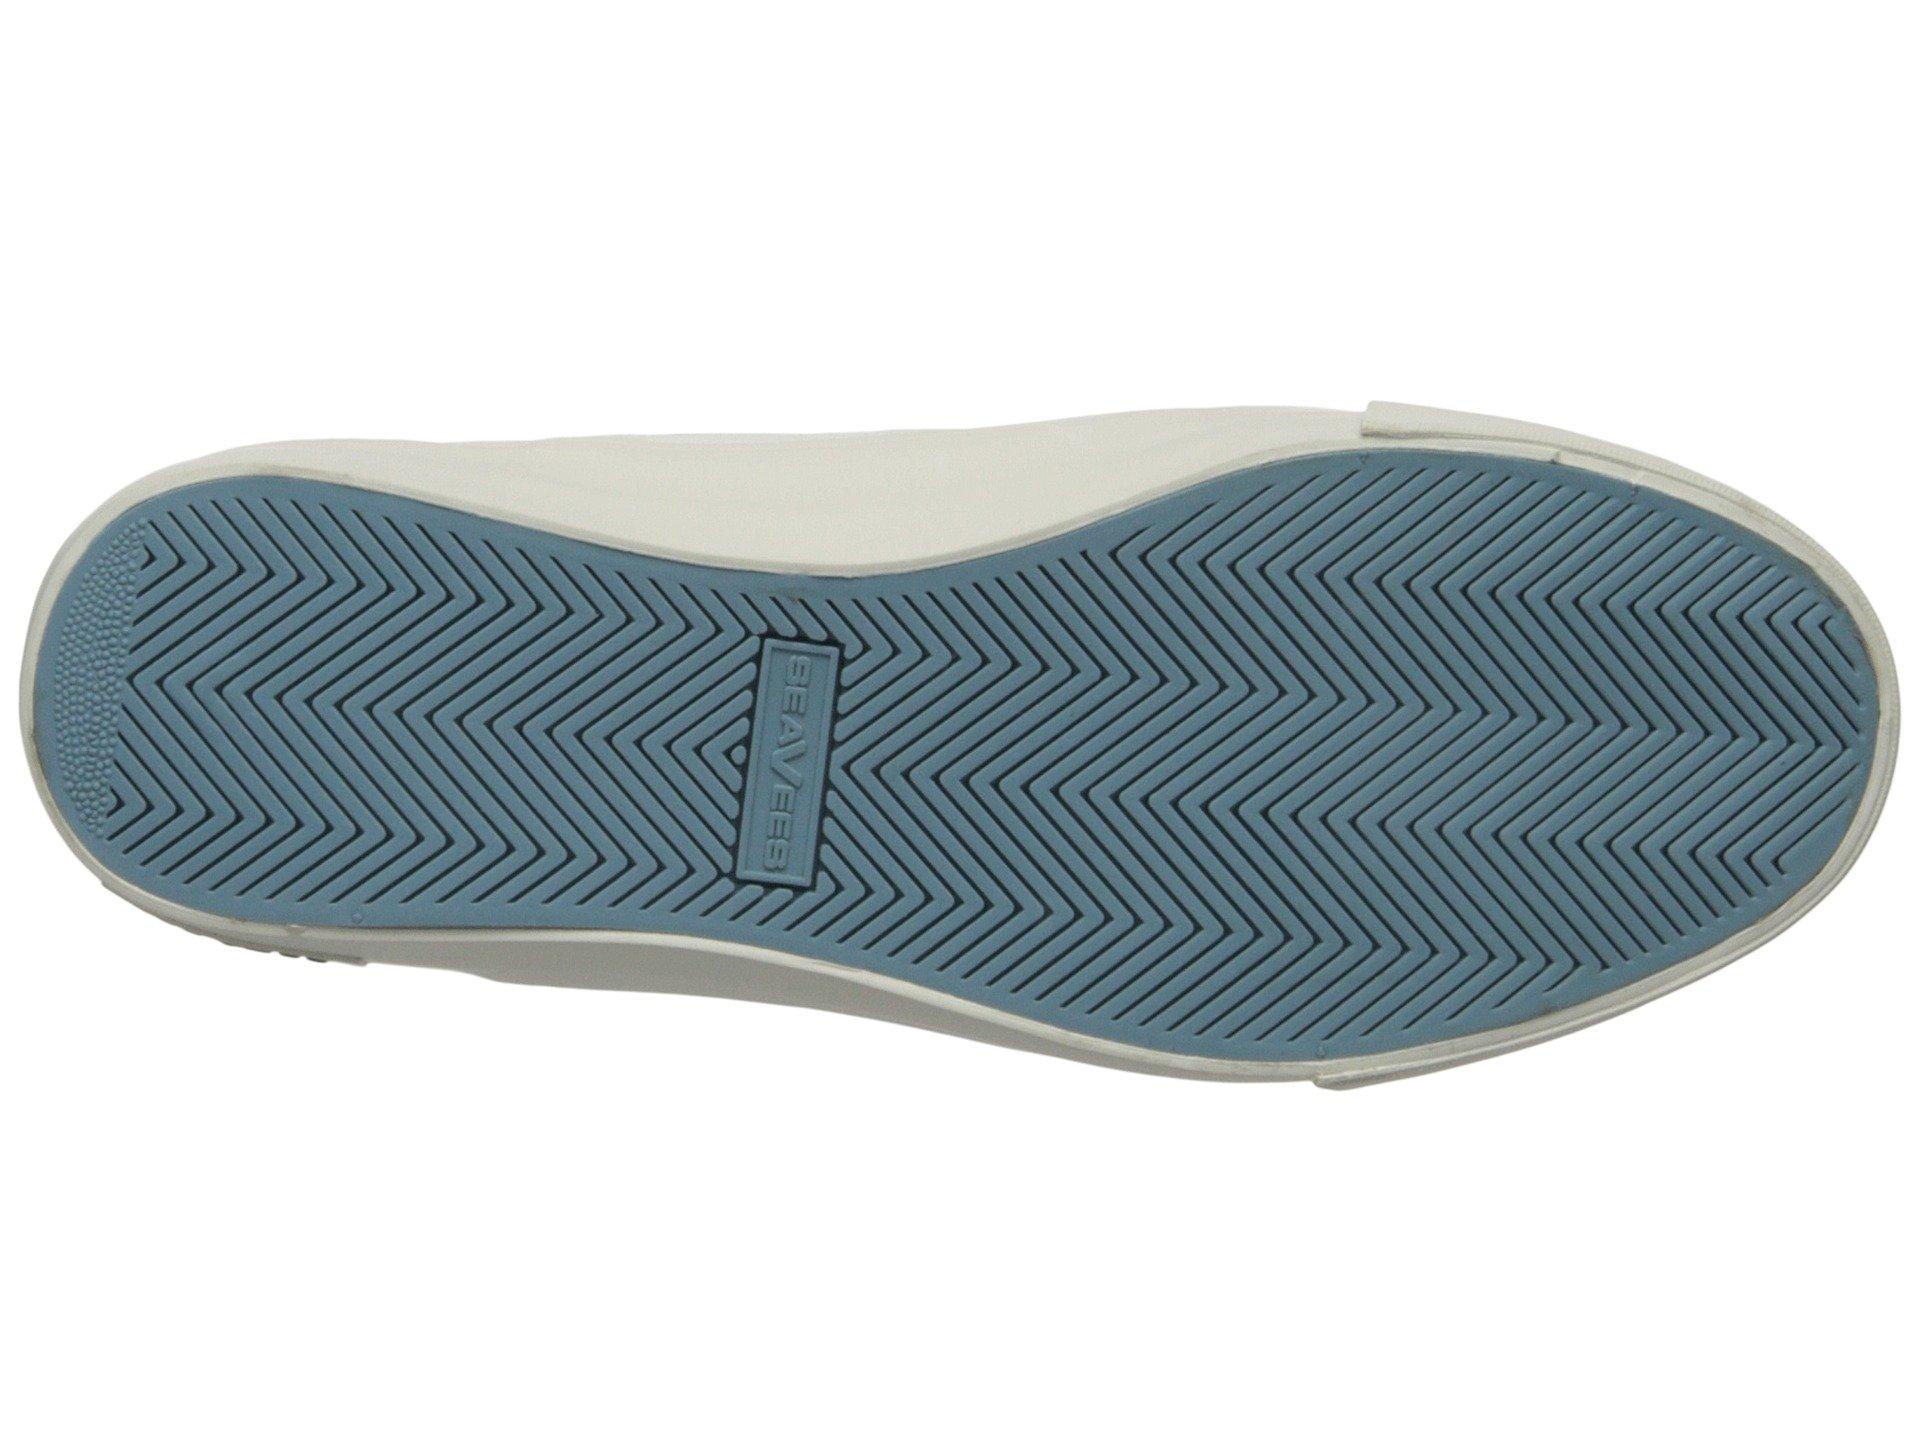 05 Bleach Slip Standard on Seavees Hawthorne 66 A7HRRqC